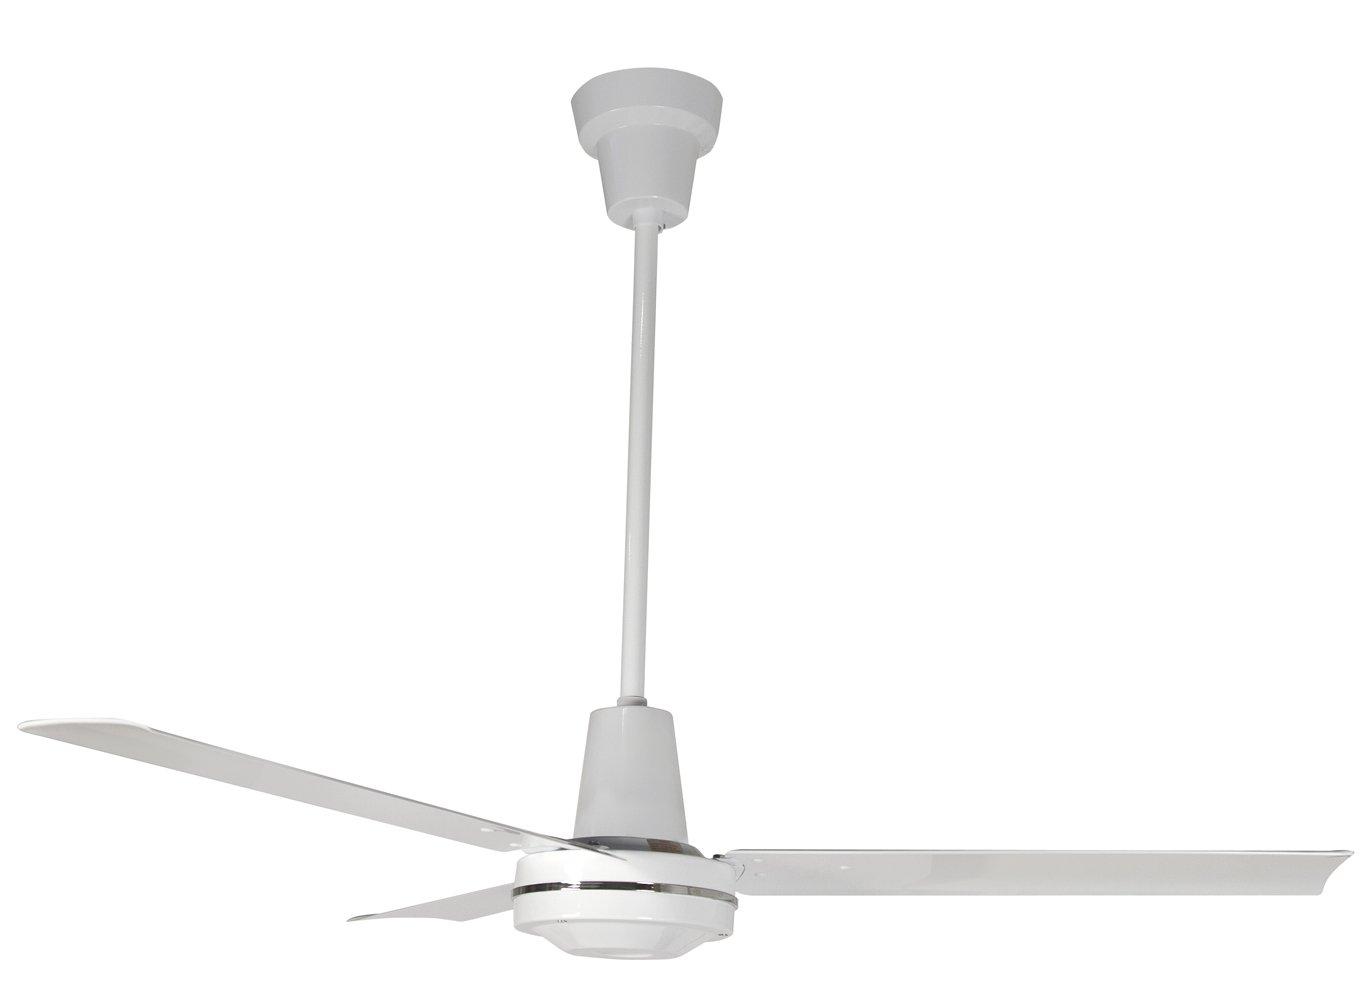 Leading edge 48201 heavy duty ceiling fan 21000 cfm white leading edge 48201 heavy duty ceiling fan 21000 cfm white amazon aloadofball Image collections